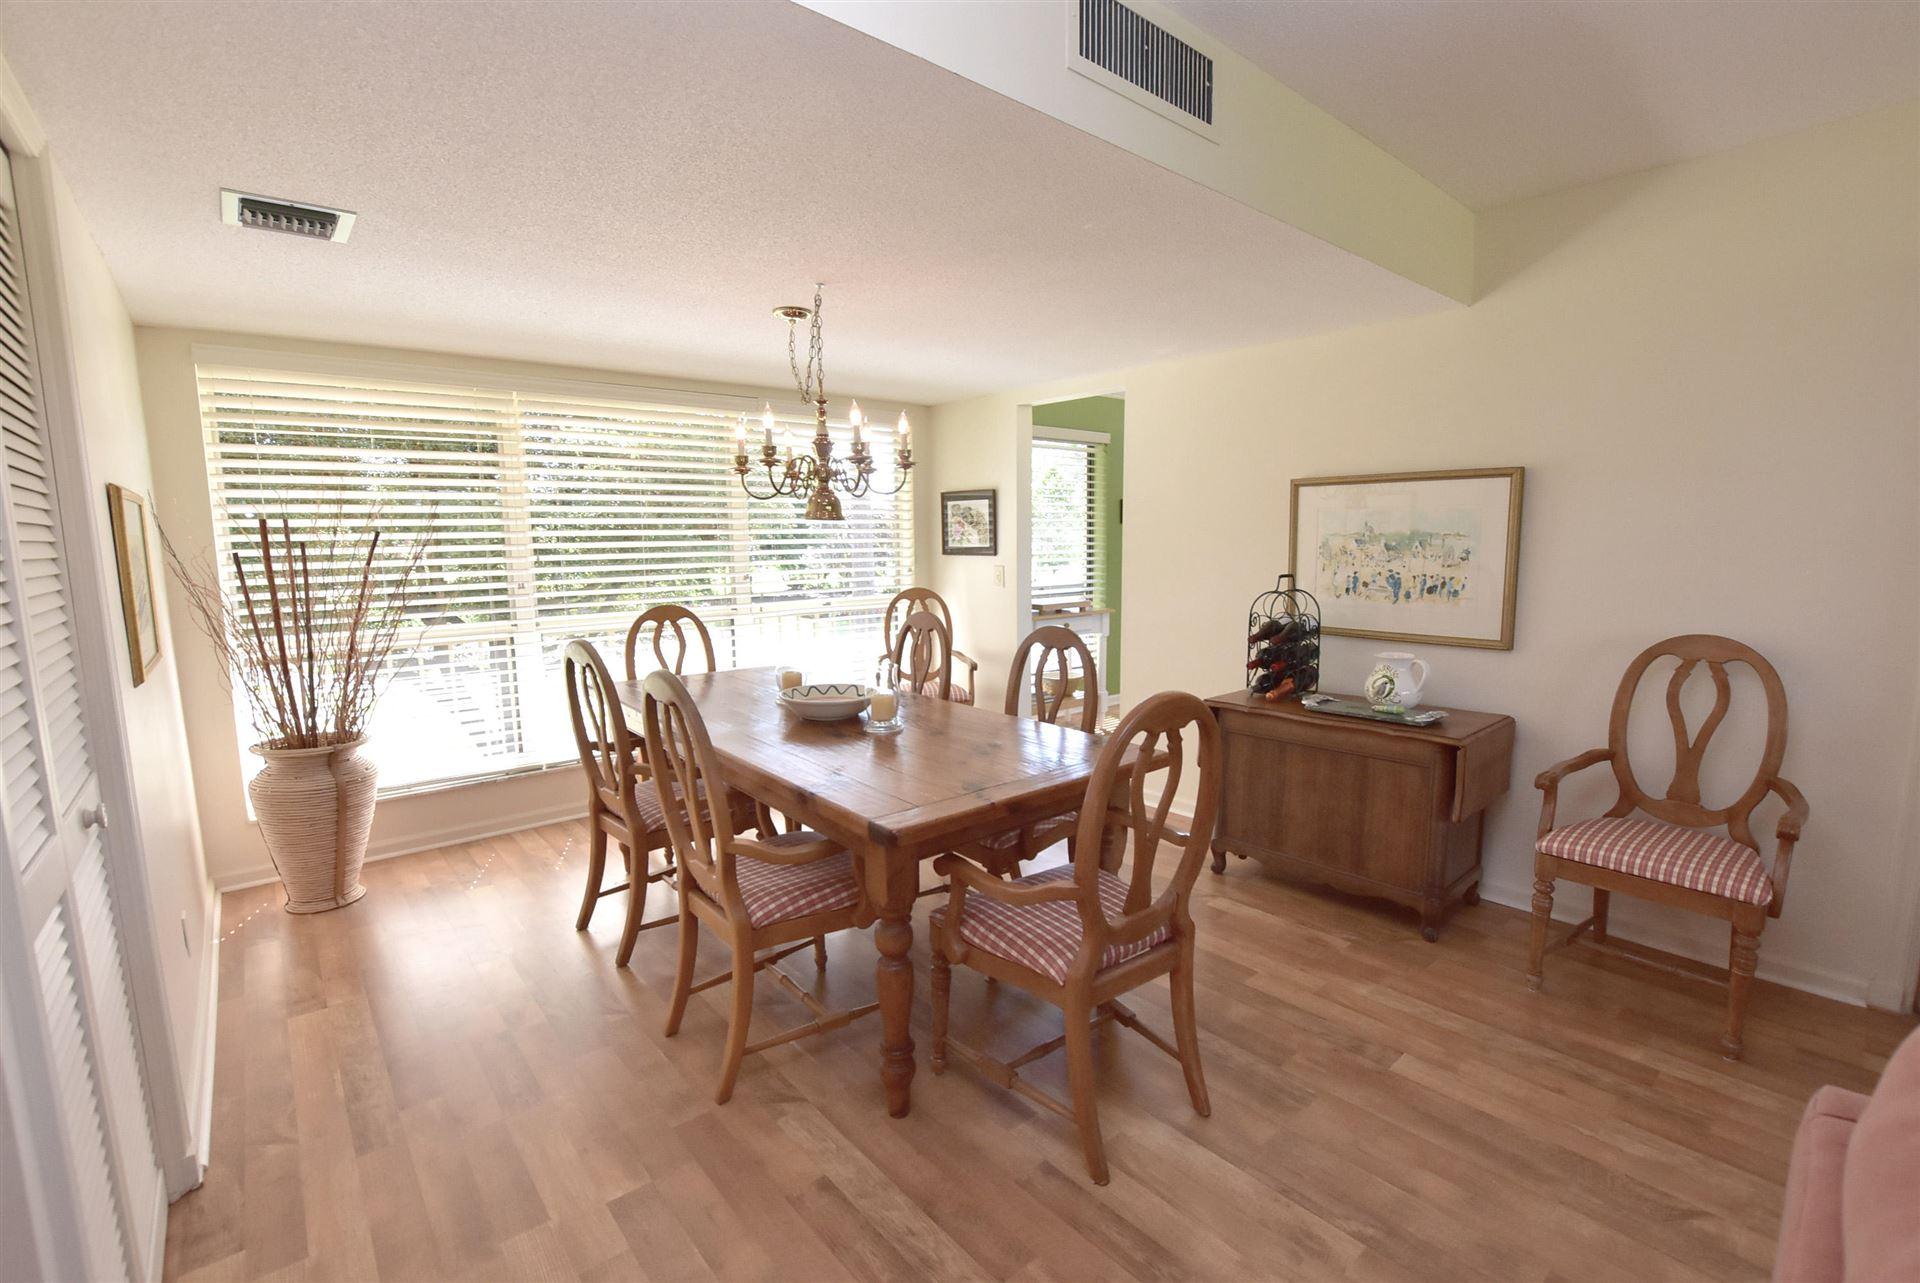 Photo of 4653 Kittiwake Court #Kingfisher N, Boynton Beach, FL 33436 (MLS # RX-10695240)